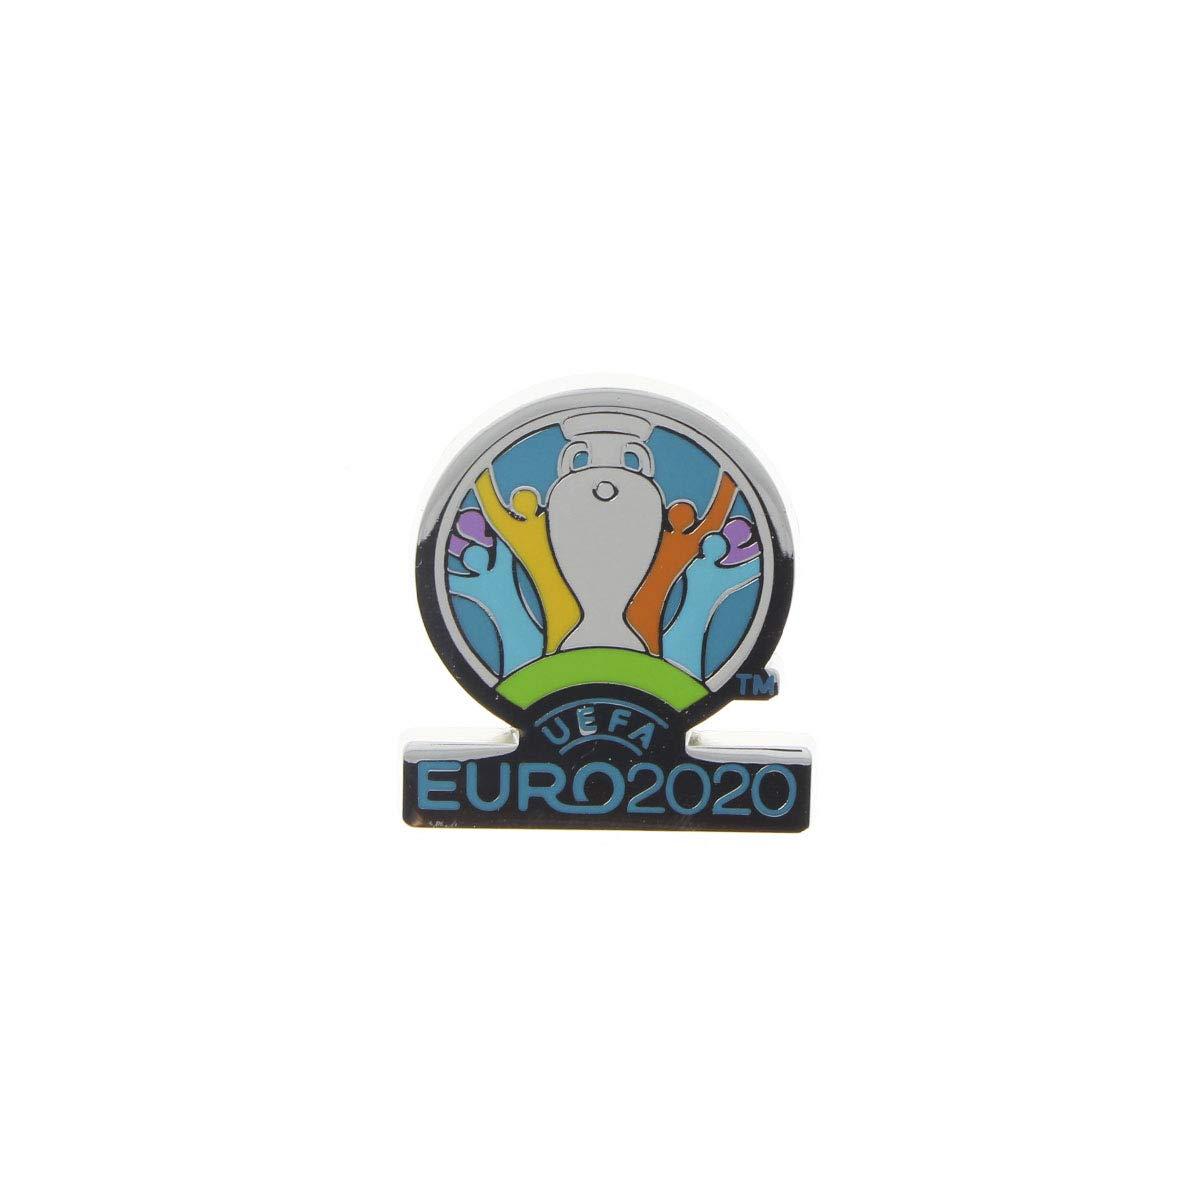 Ansteckpin Skillzy offizielles Maskottchen in Crossover Pose 4 cm UEFA EURO 2020/™